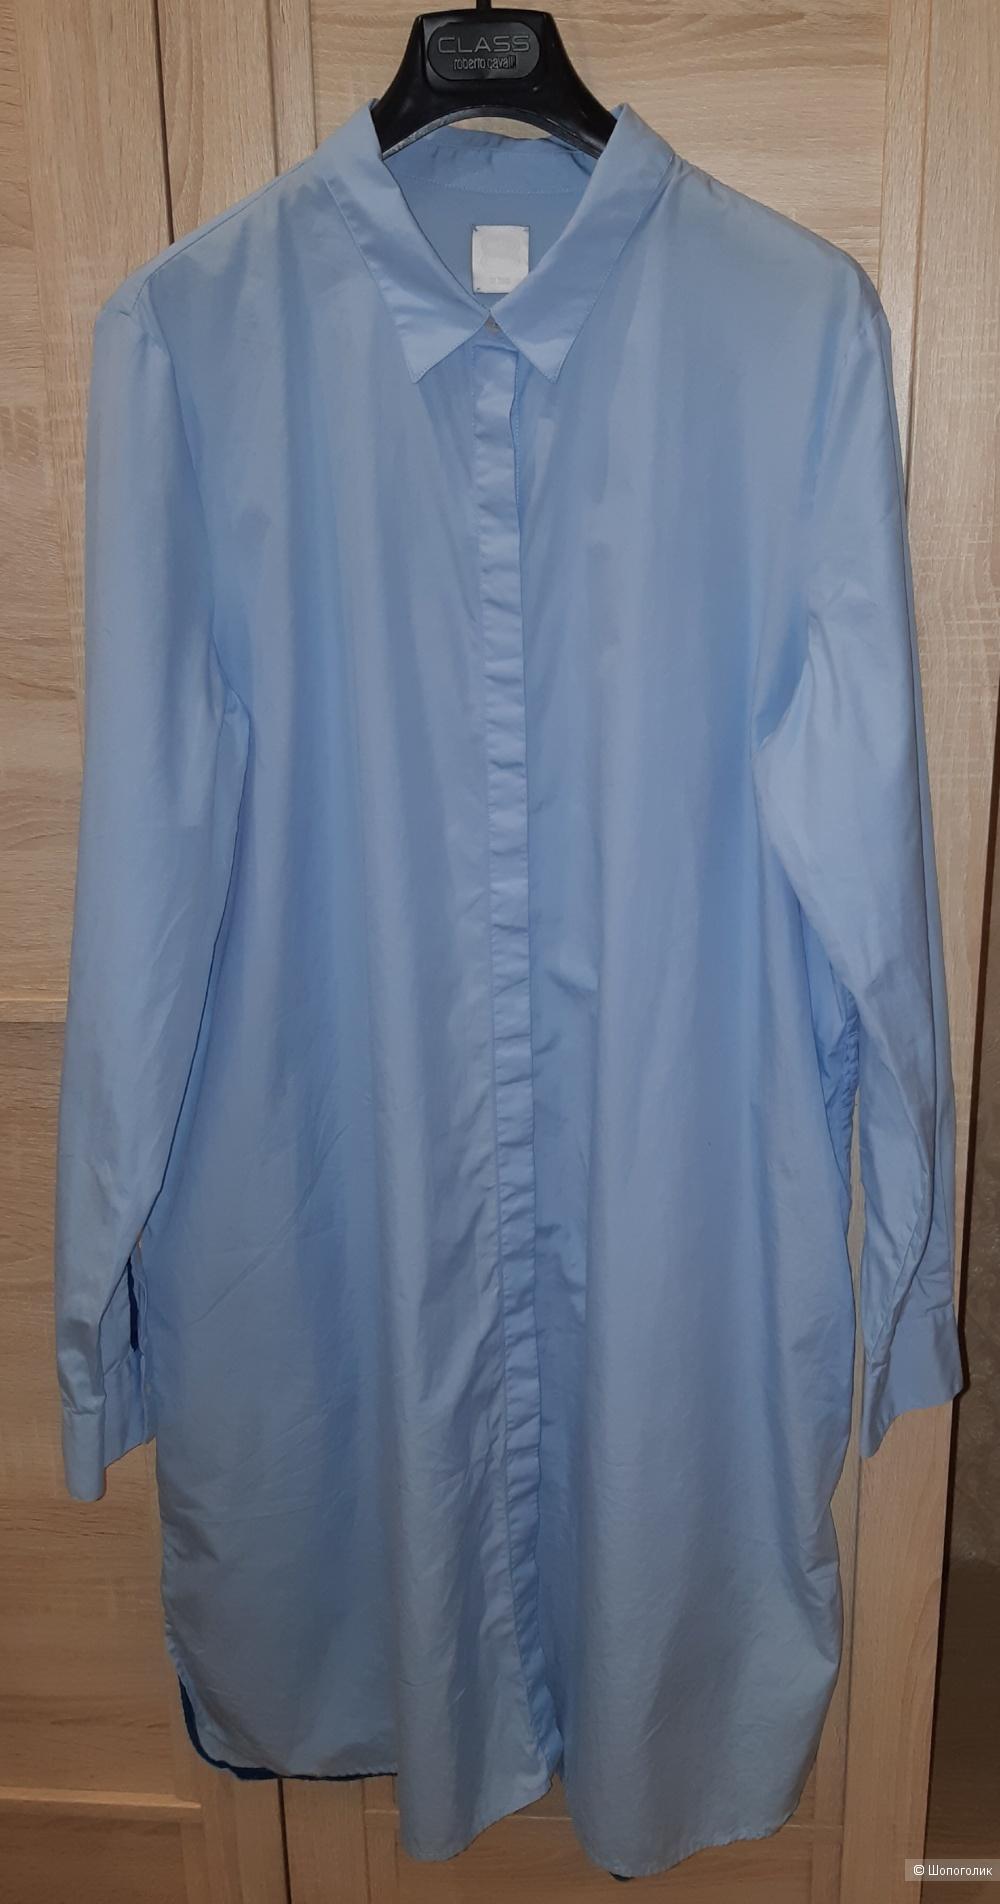 Платье-рубашка 8 by yoox, размер 46/48/50